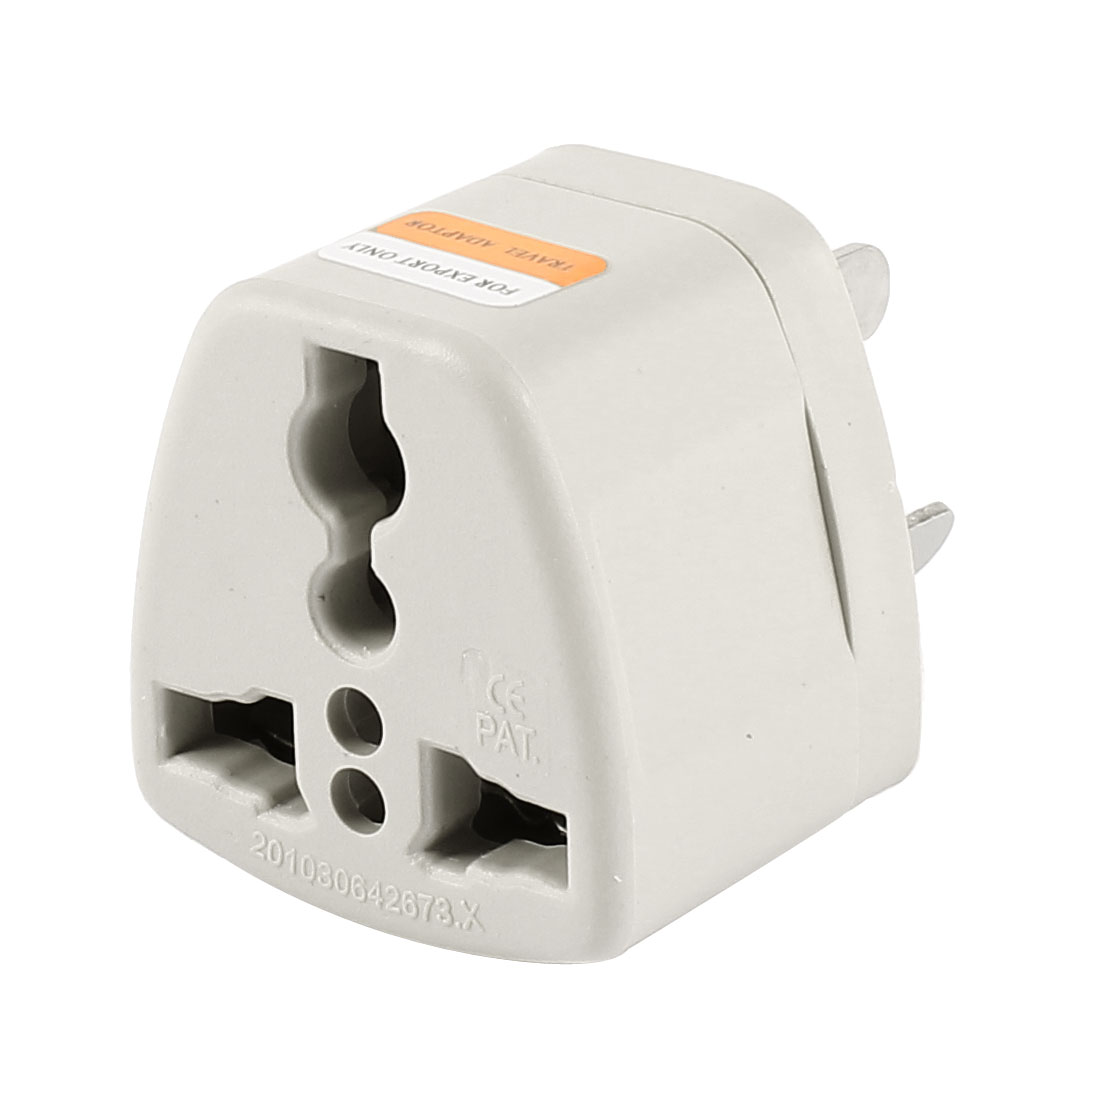 AU Plug AC 250V 10A to EU UK US Socket Travel Wall Adapter Converter Gray